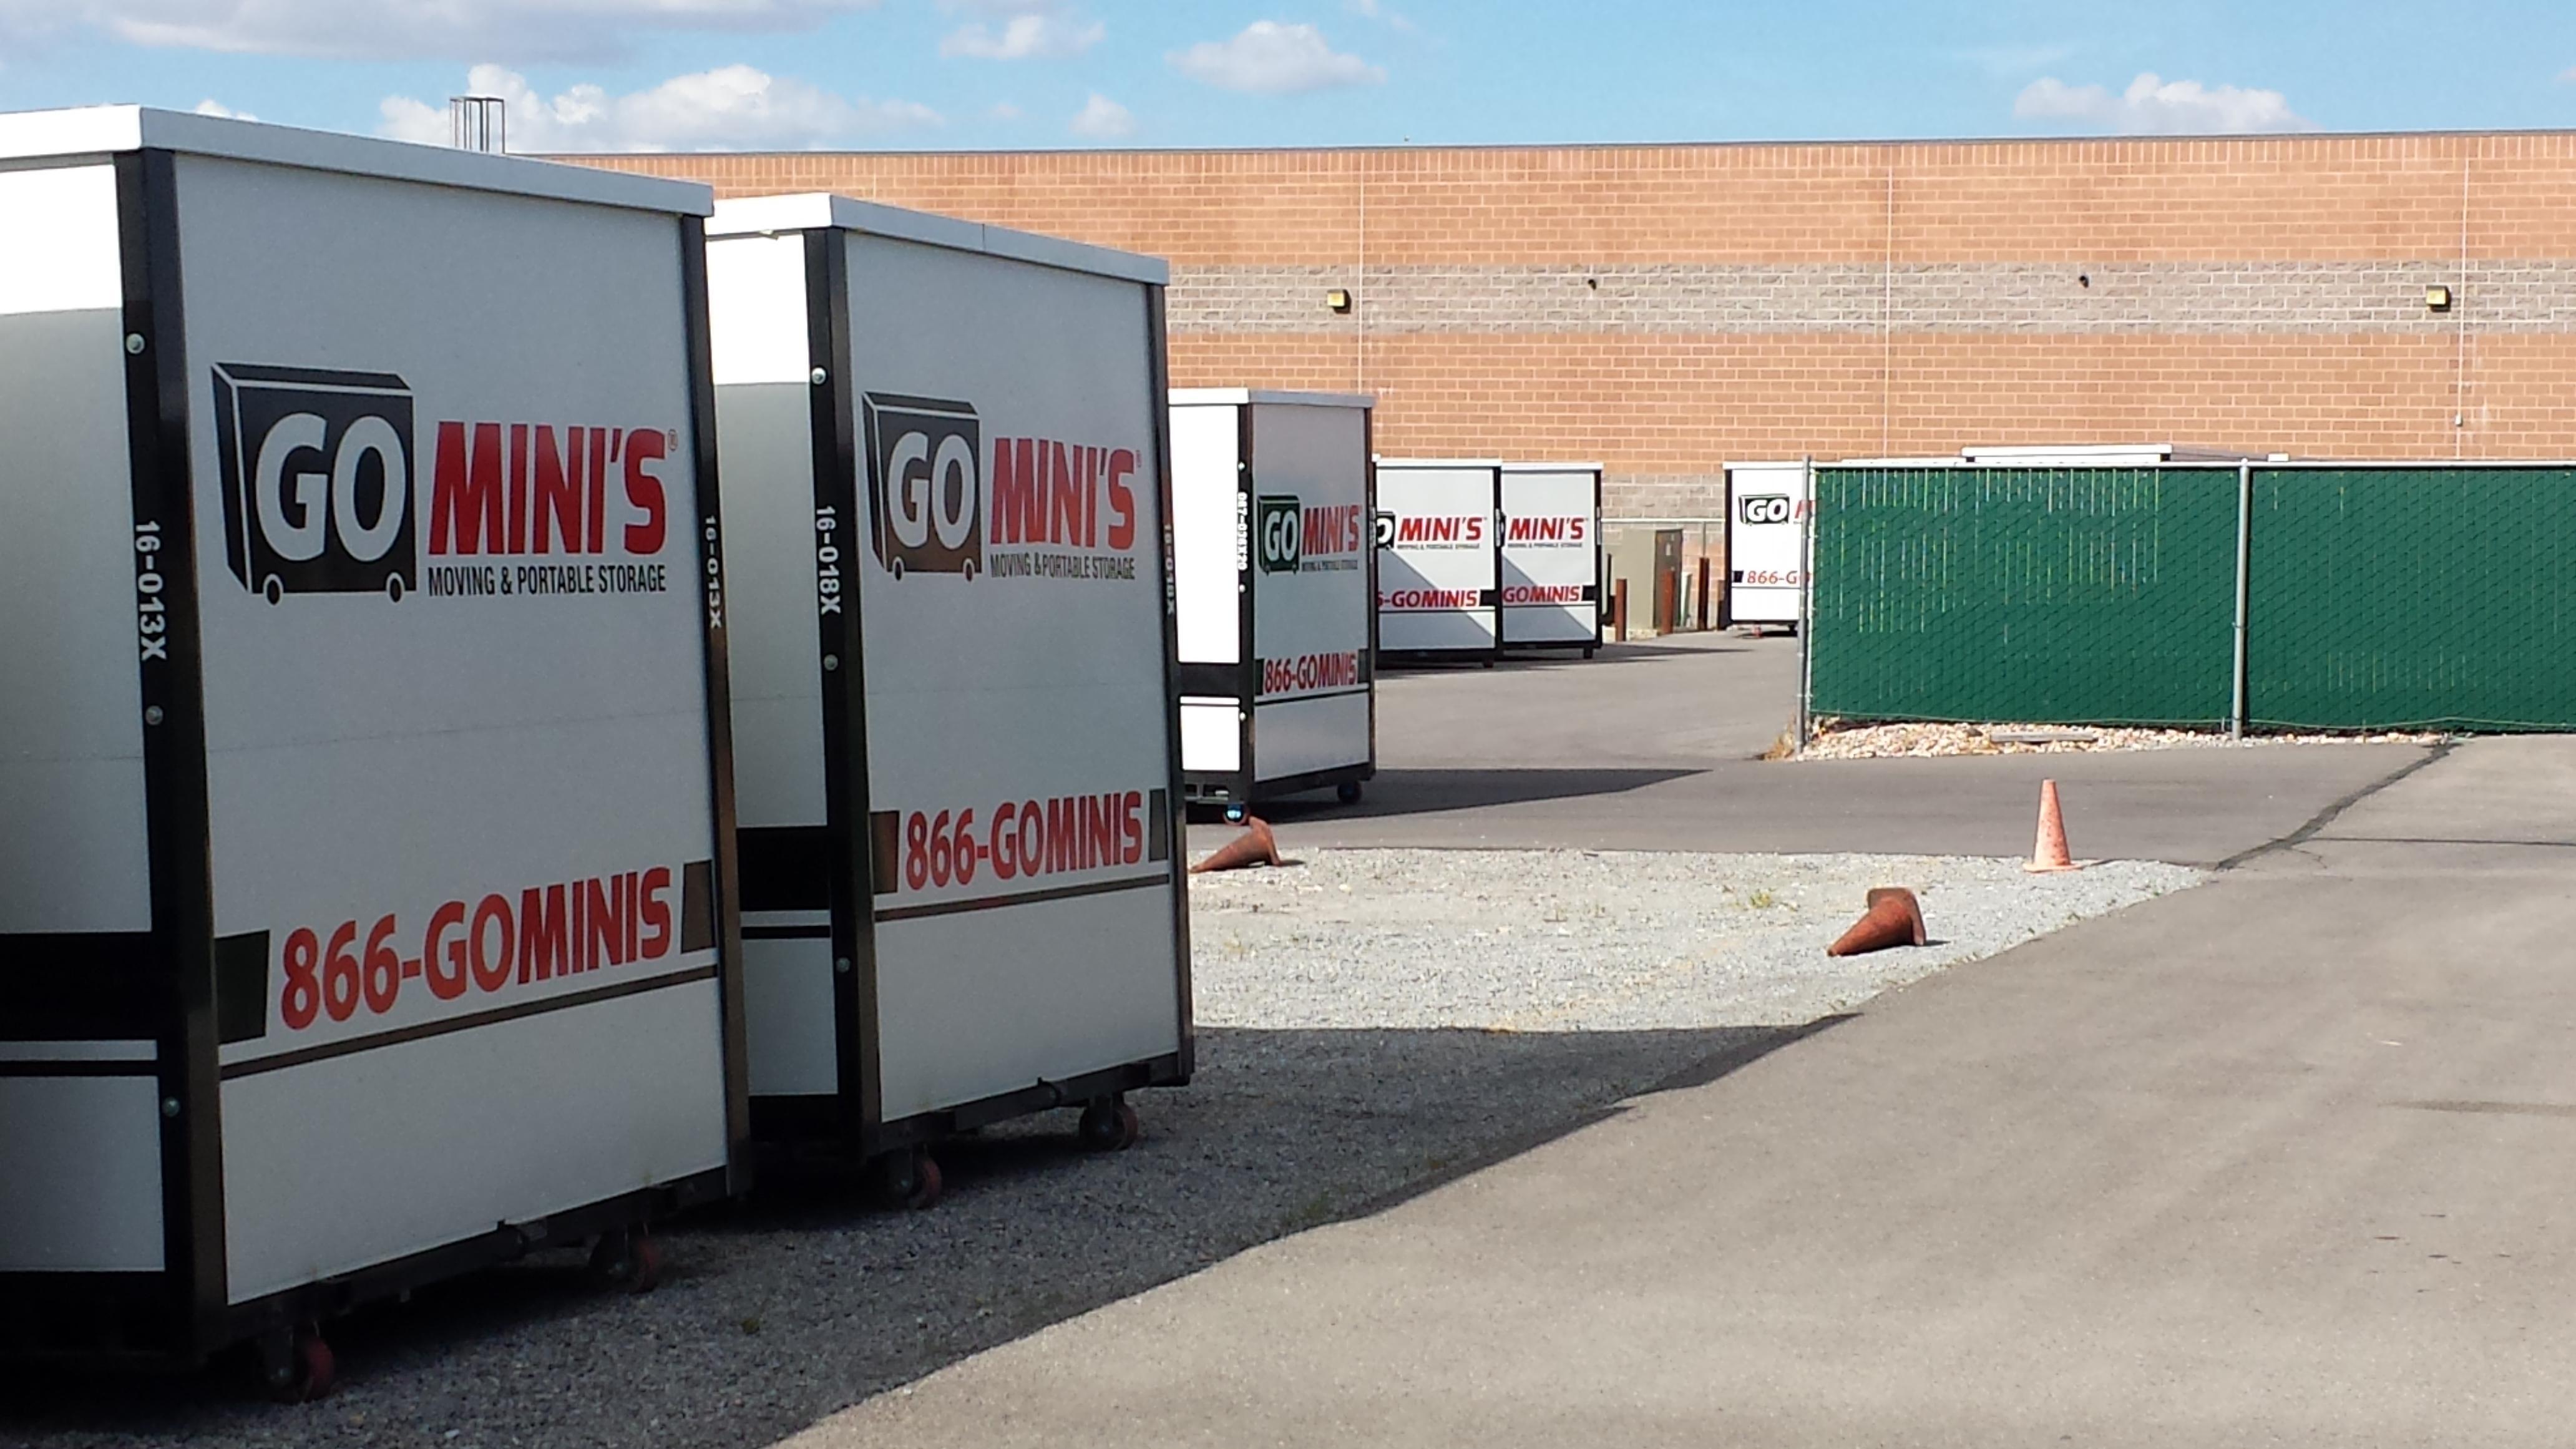 Go Mini's Moving & Portable Storage image 32